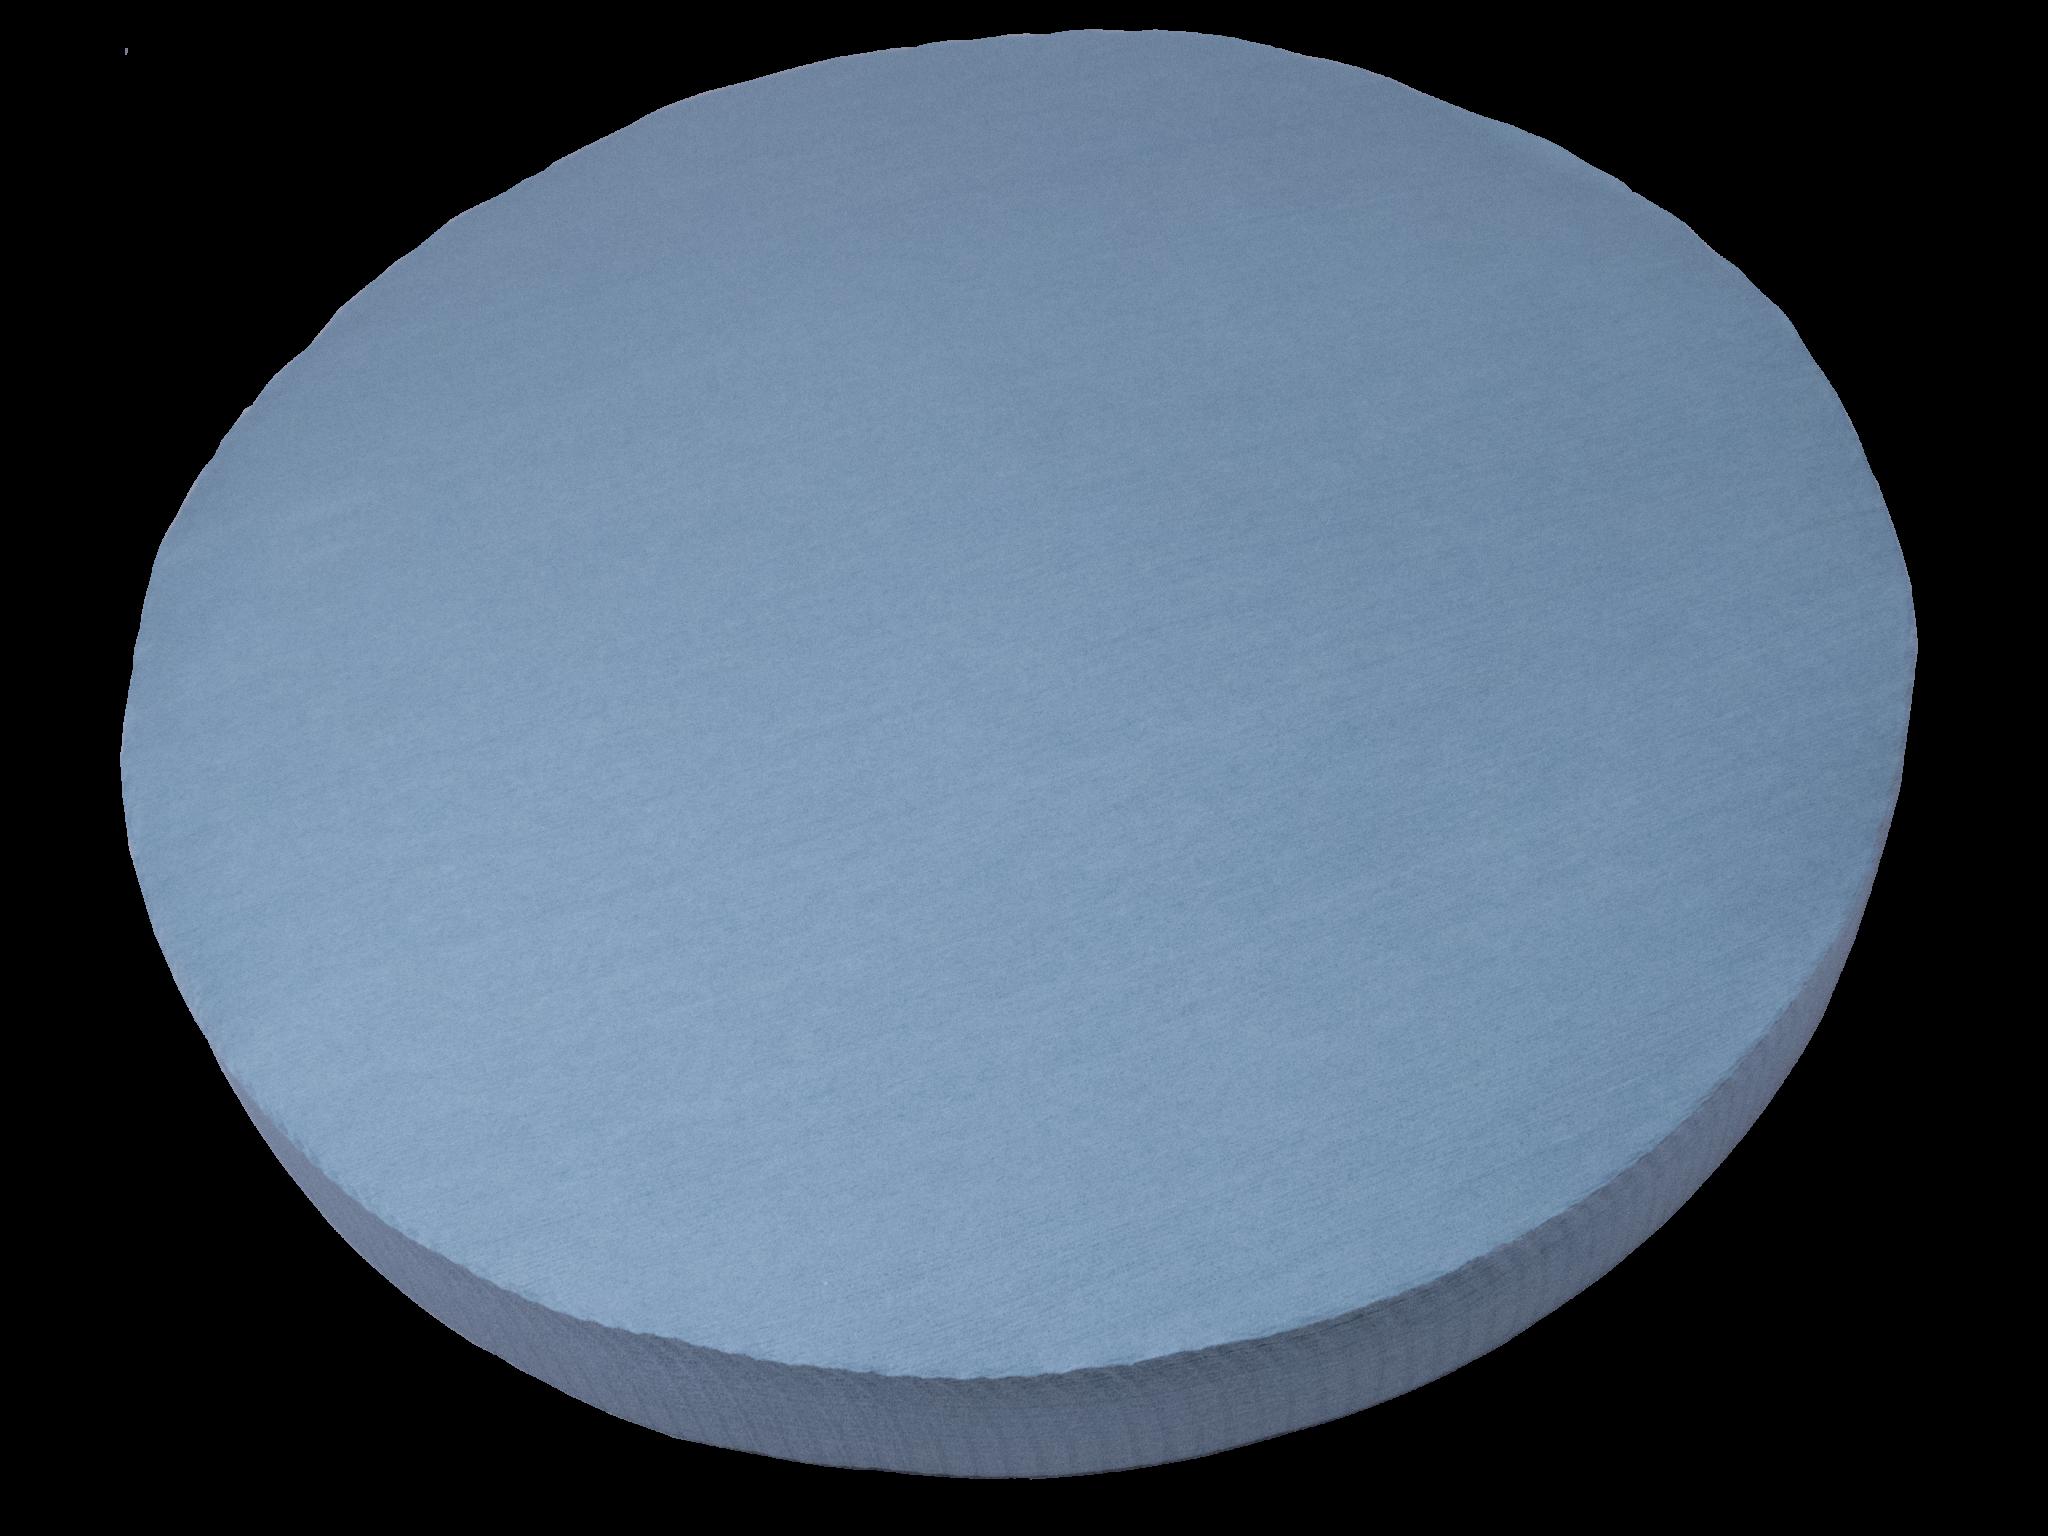 #08062 Sontex™ Circular Wiper